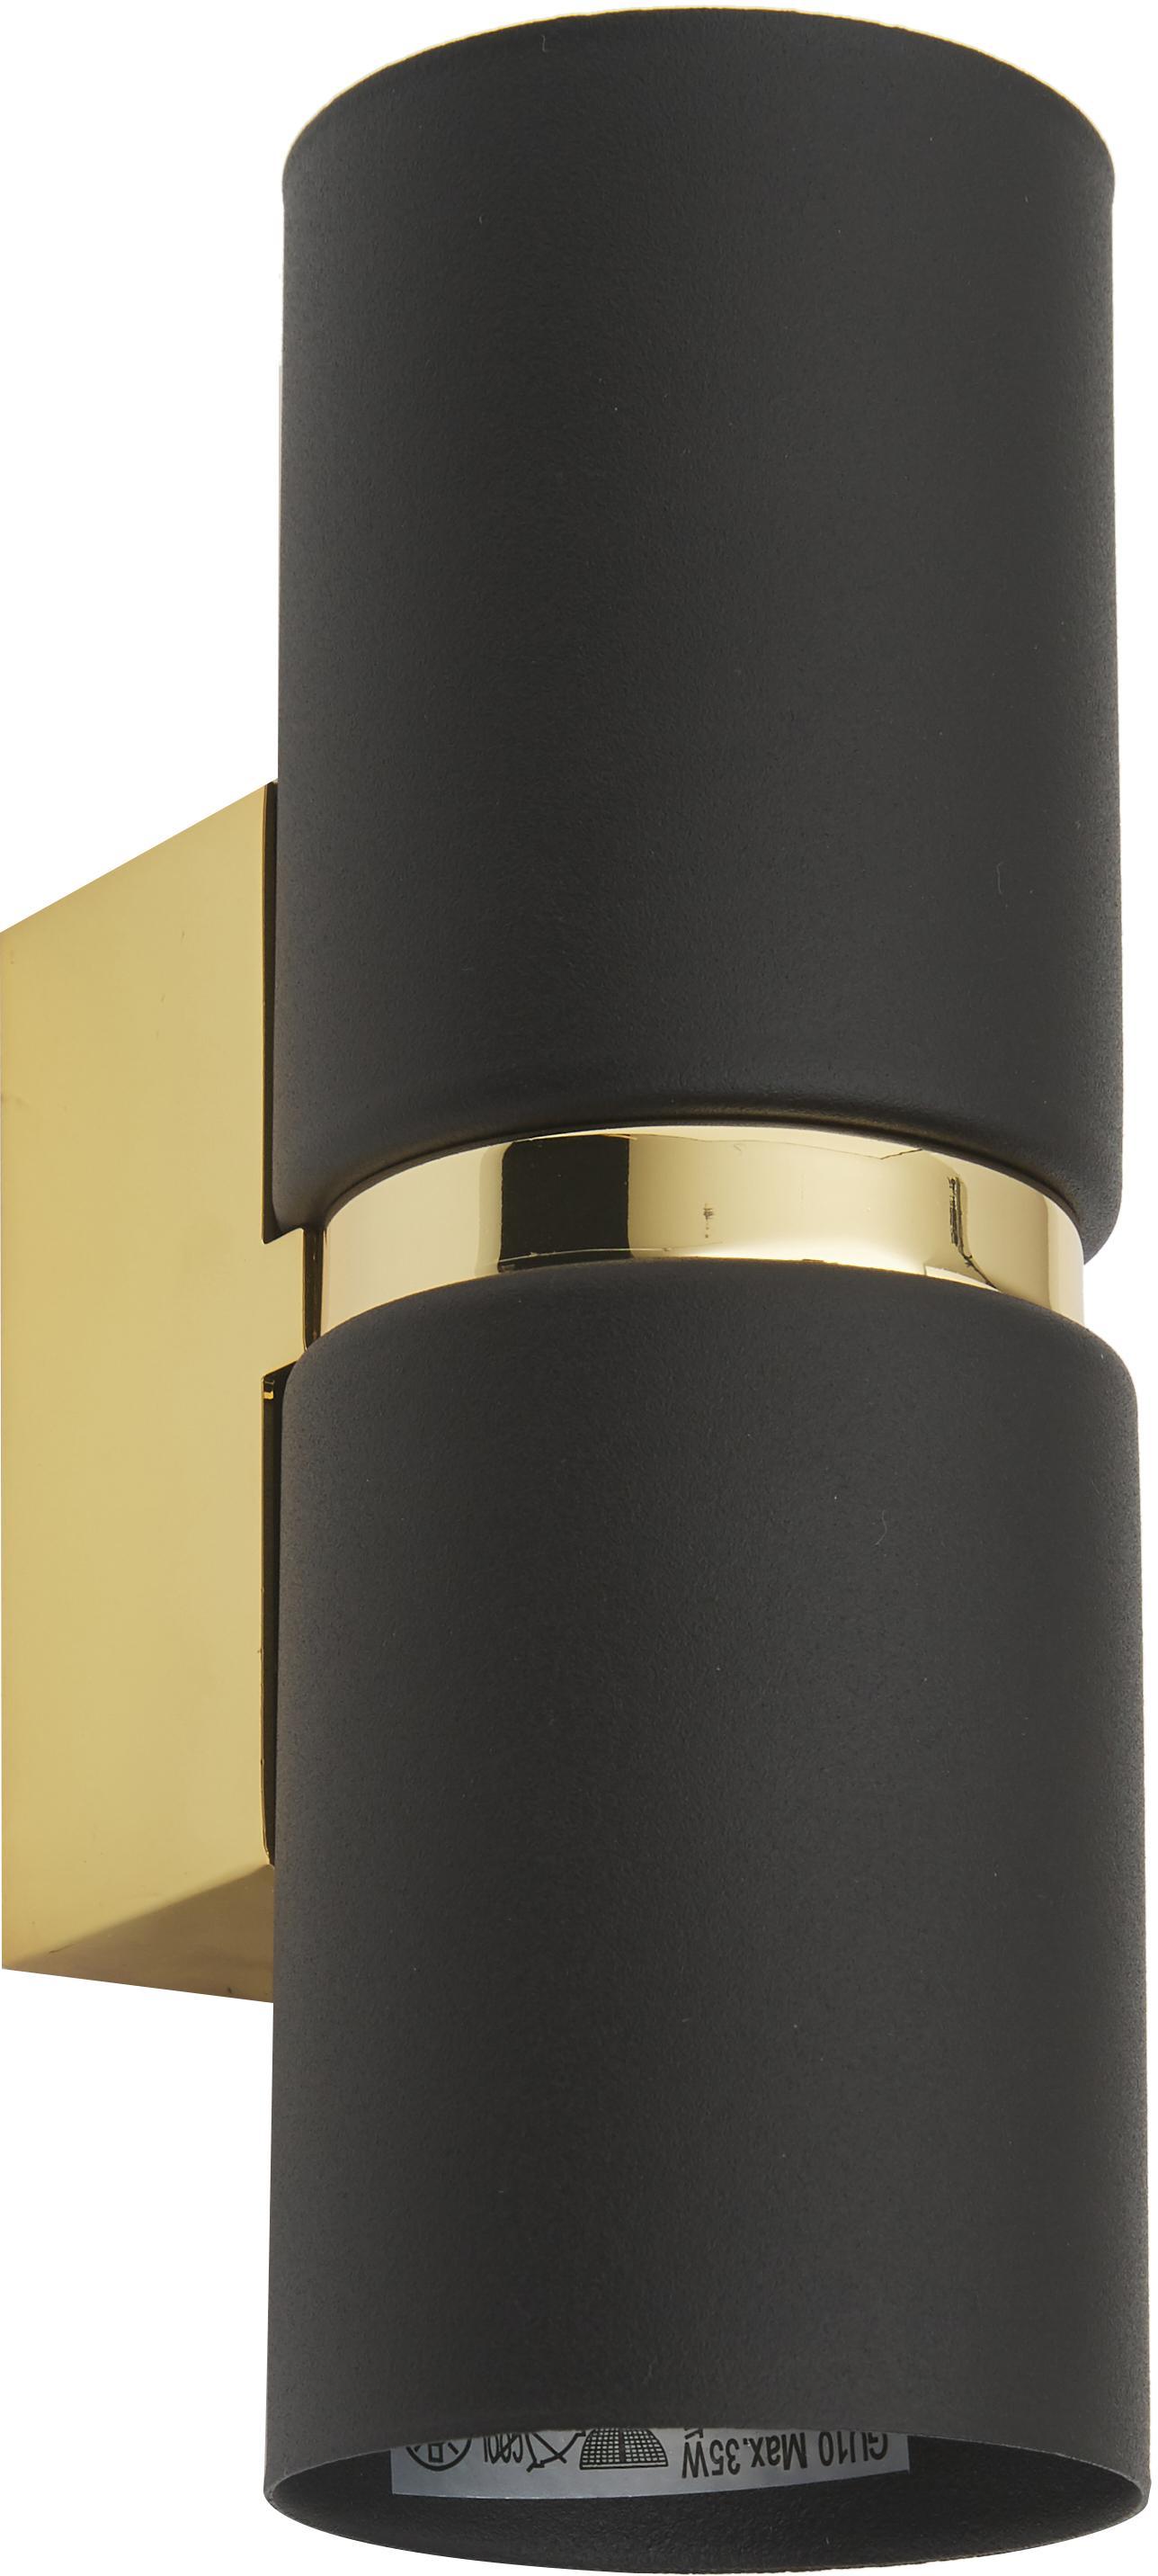 Aplique Passa, Acero, pintado, Negro, dorado, An 6 x Al 17 cm